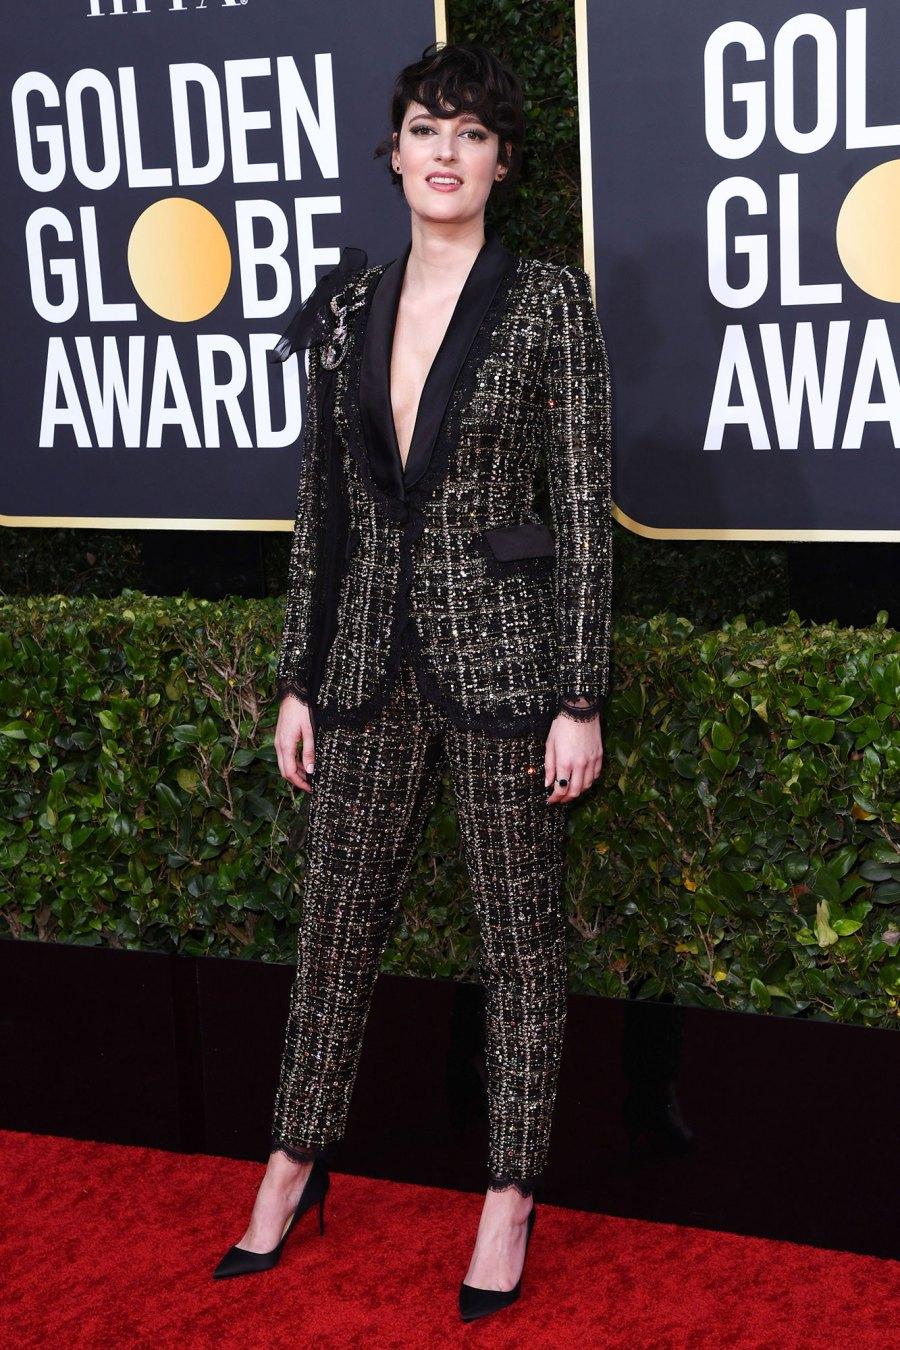 Phoebe Waller-Bridge Wearing Ralph & Russo Golden Globes 2020 Celebrity Charity